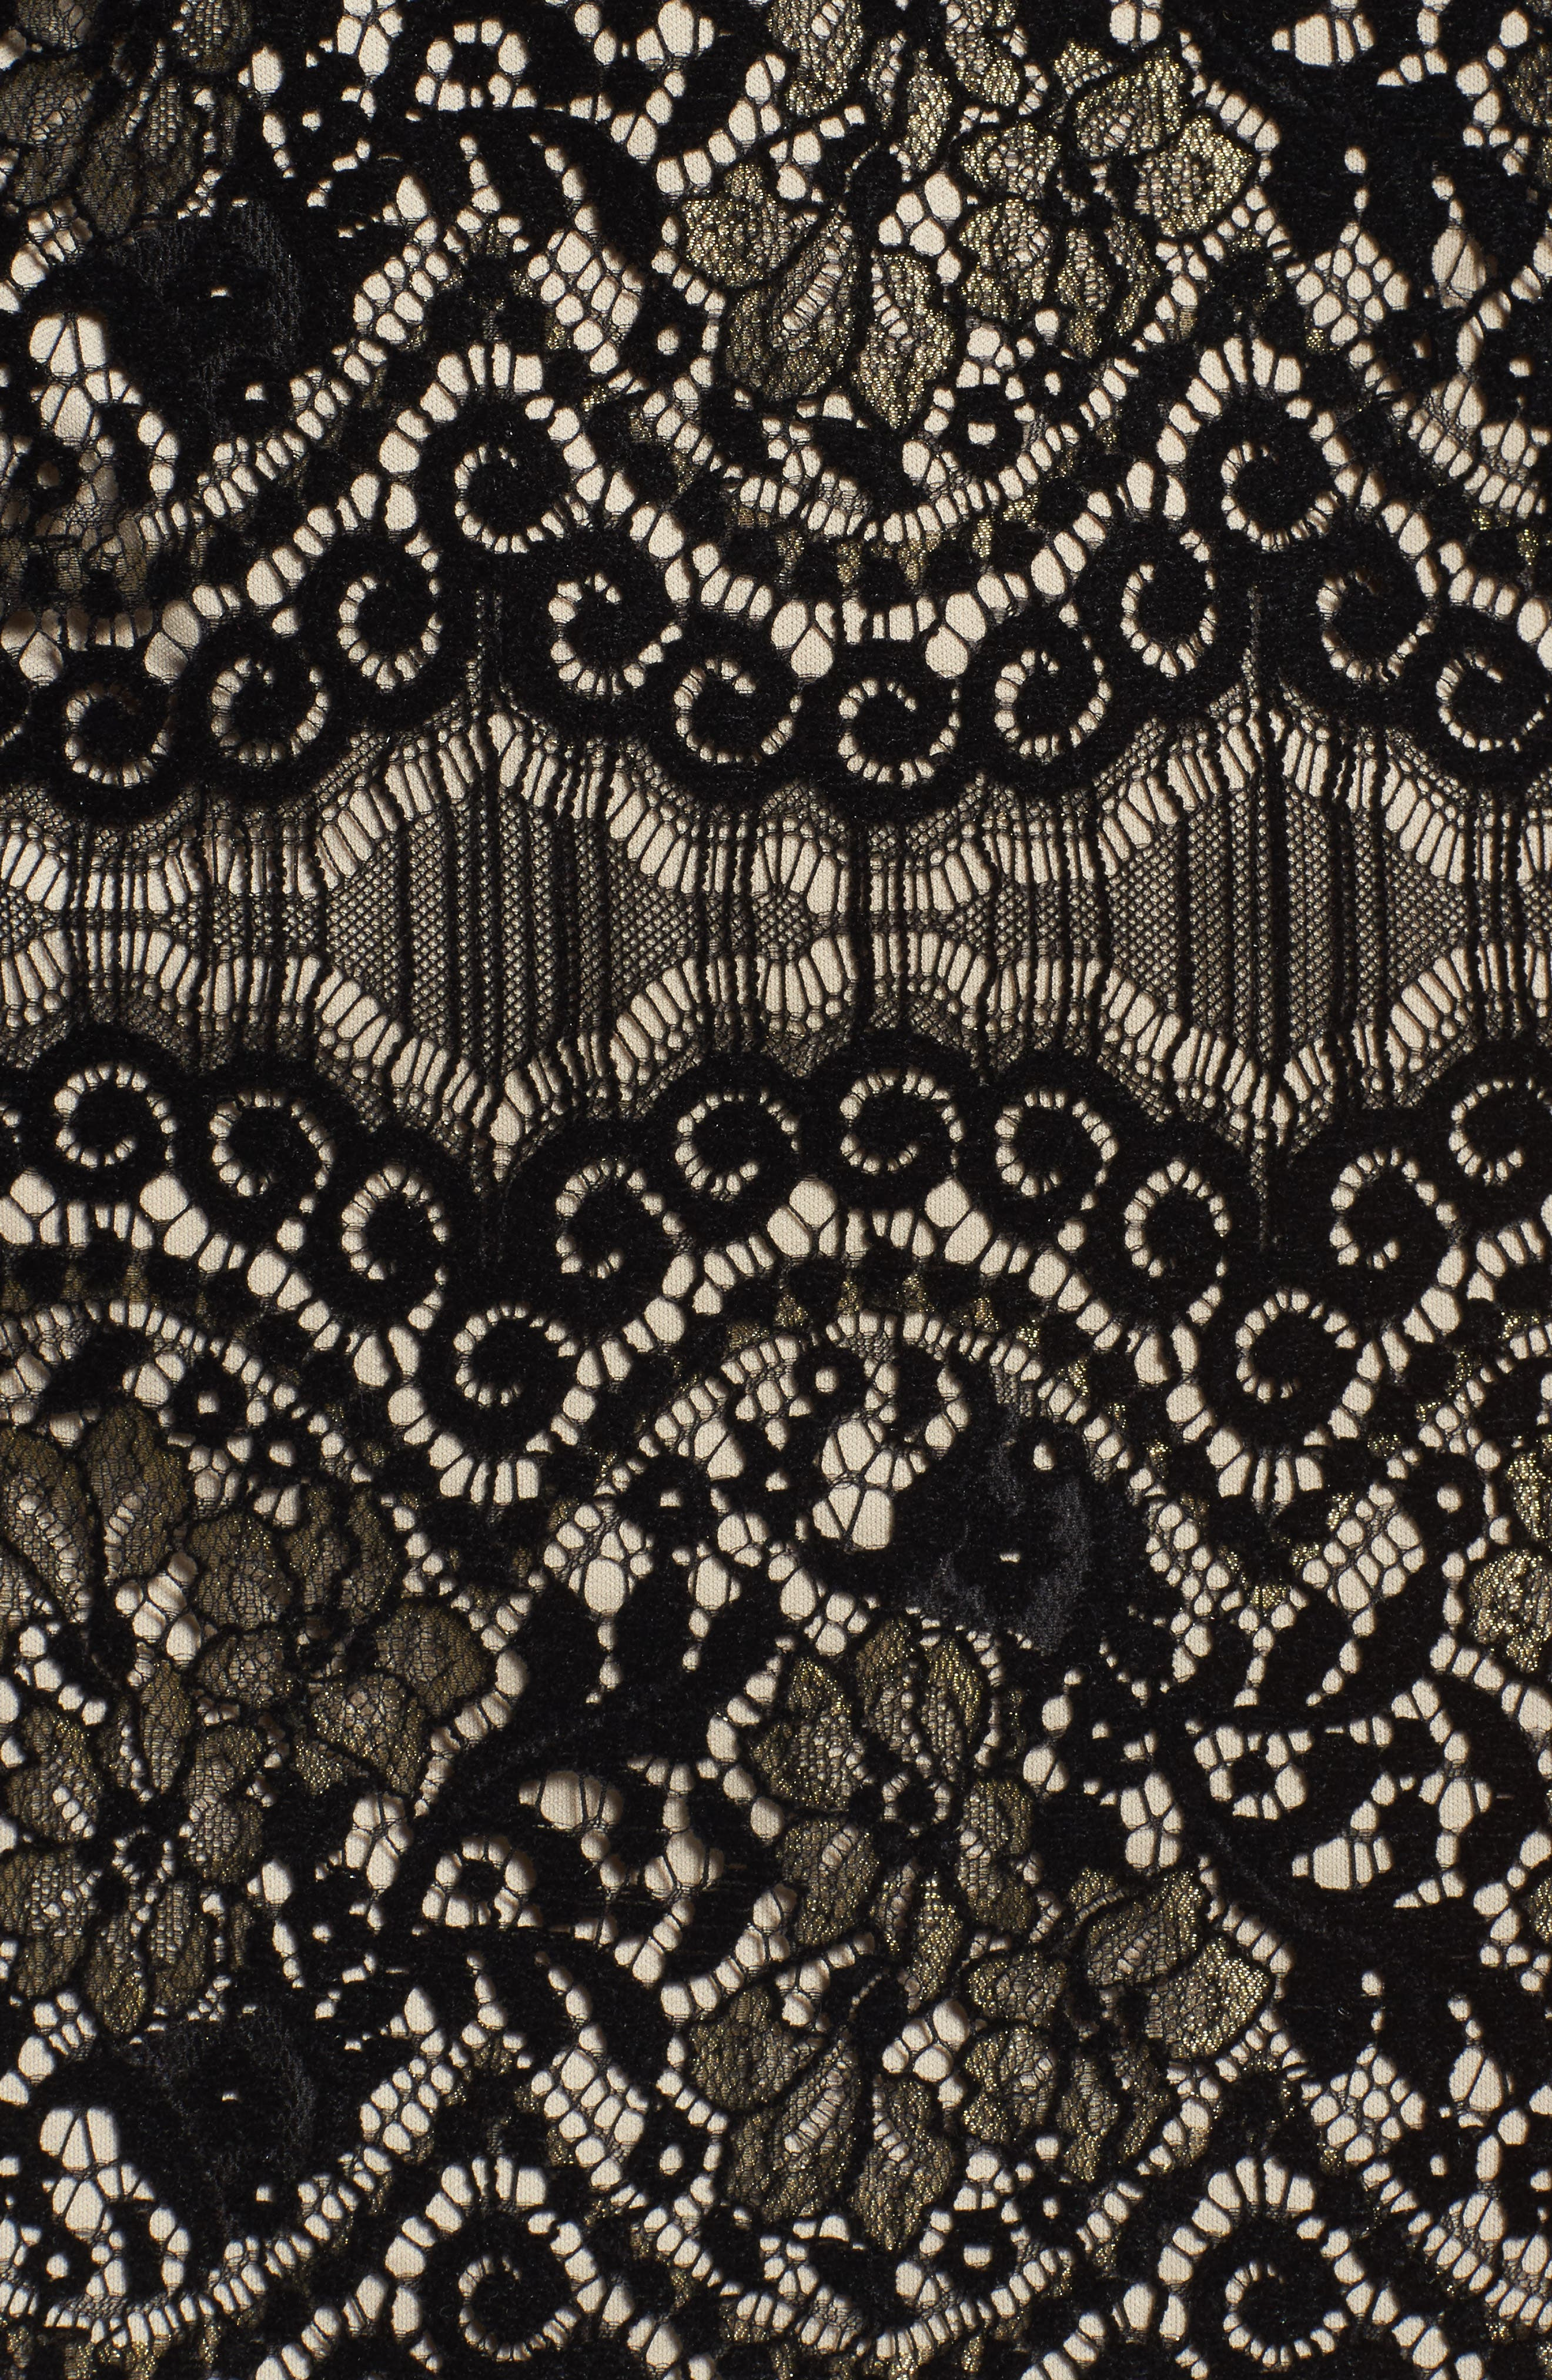 Flocked Lace Shift Dress,                             Alternate thumbnail 5, color,                             001